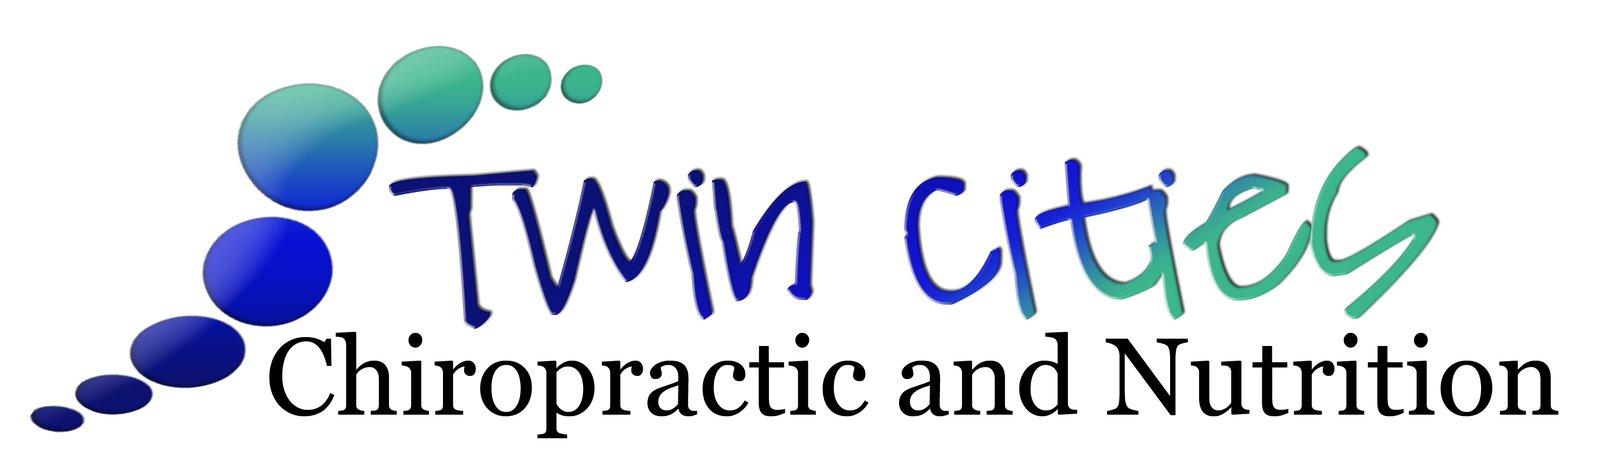 Twin Cities Chiropractic and Nutrition/Globe University Woodbury